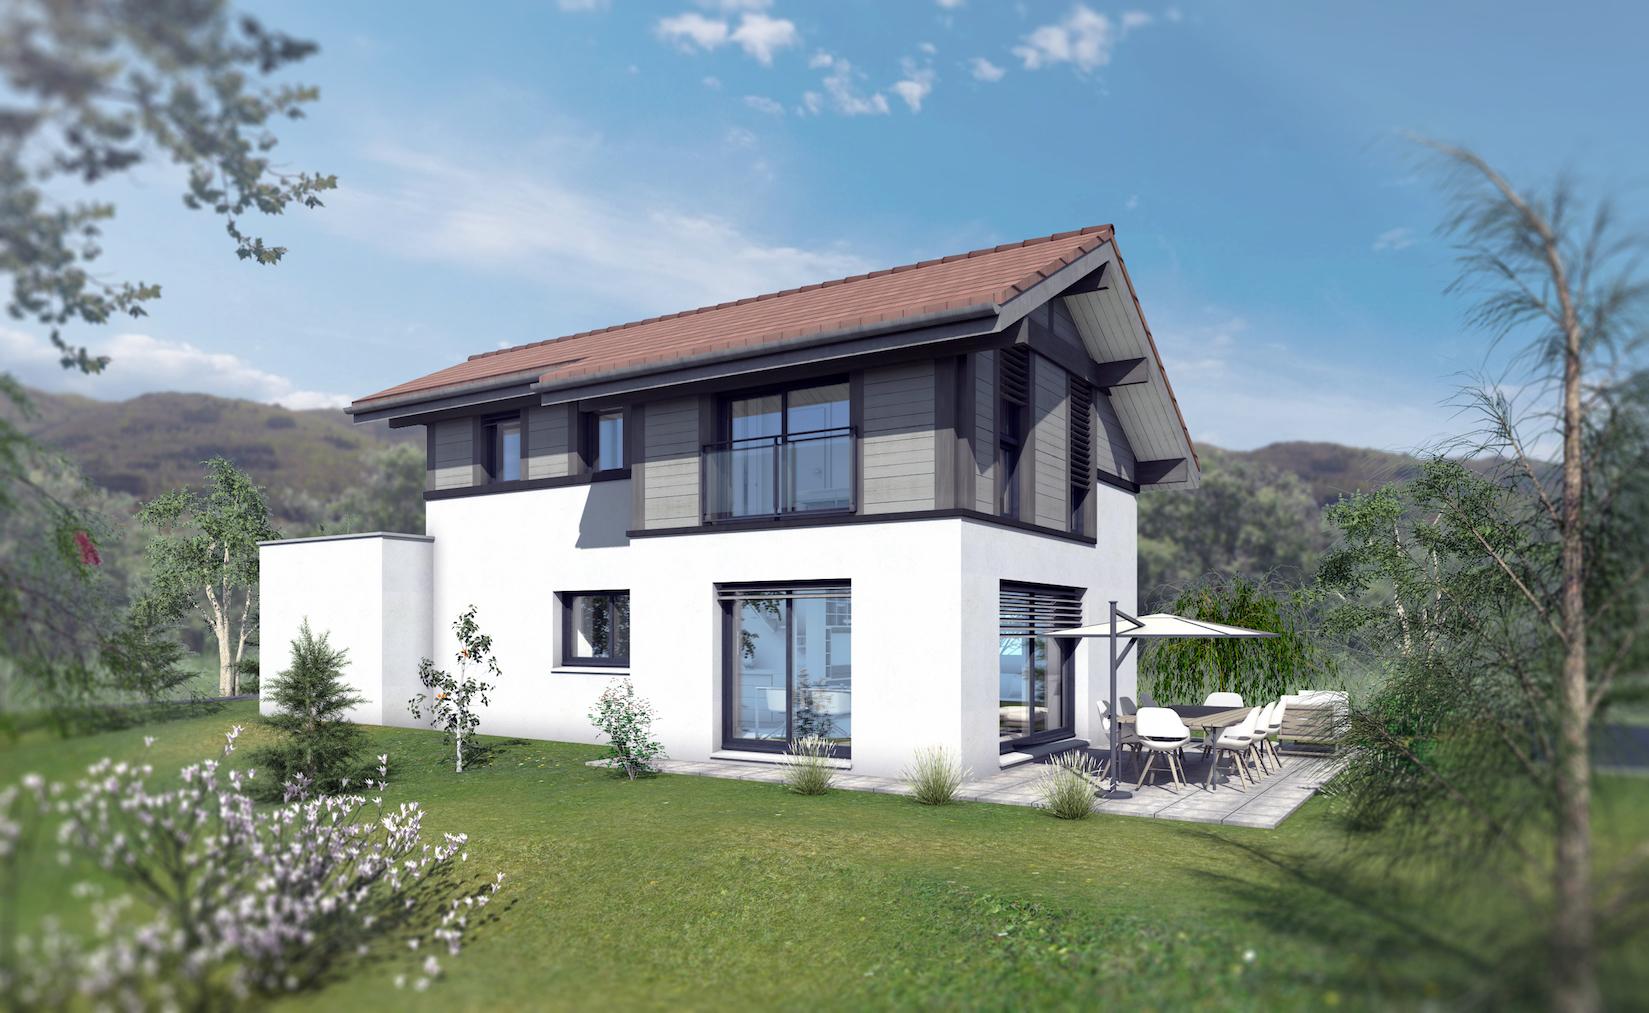 Maisons + Terrains du constructeur EDEN HOME • 103 m² • VALLEIRY